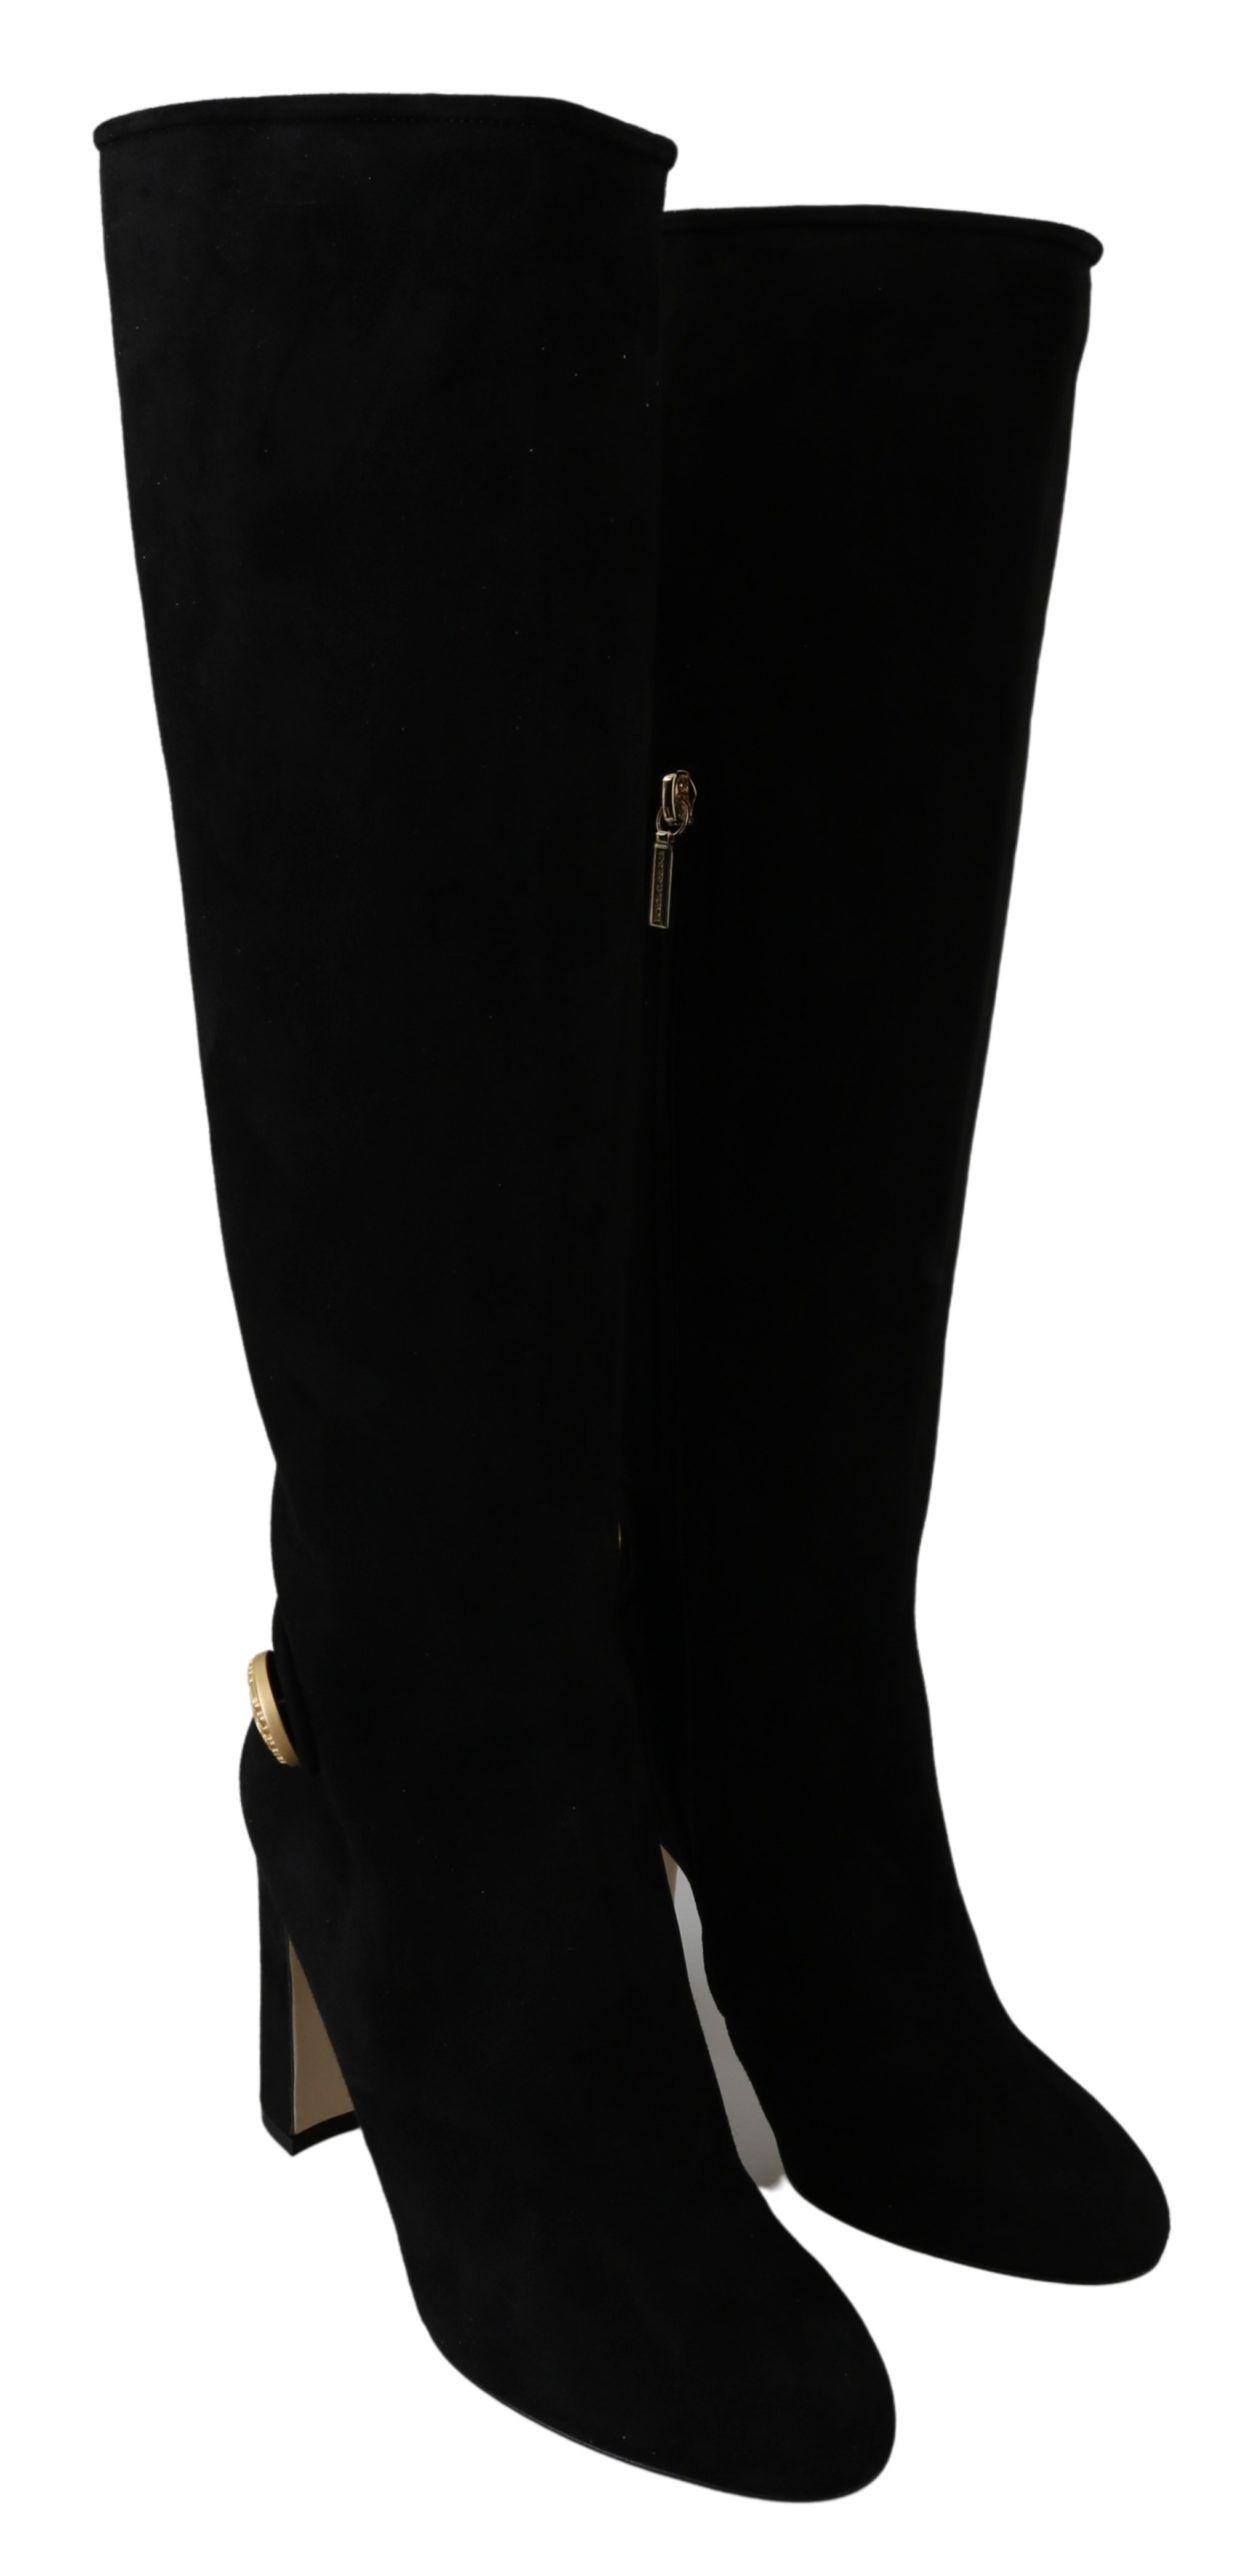 Dolce & Gabbana Black Suede Gold DG Logo Knee Boots Shoes